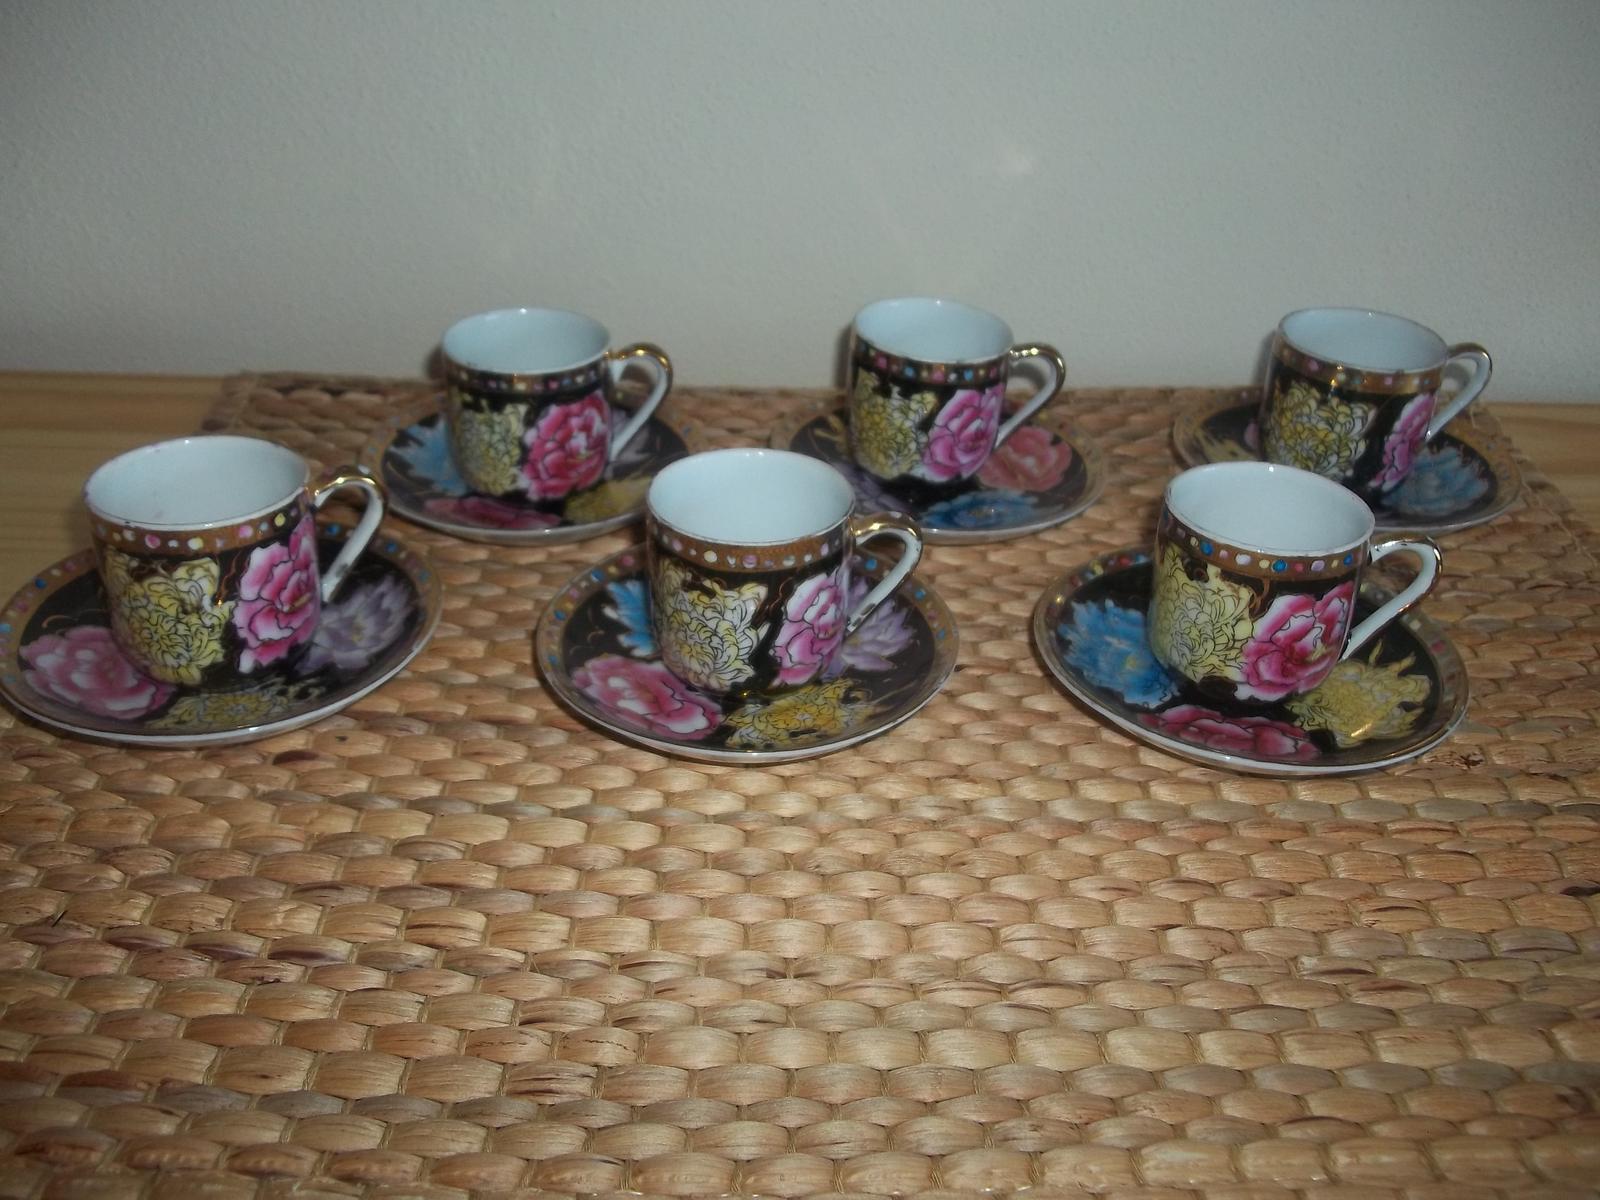 Staručké šálky z čínskeho porcelánu - Obrázok č. 1